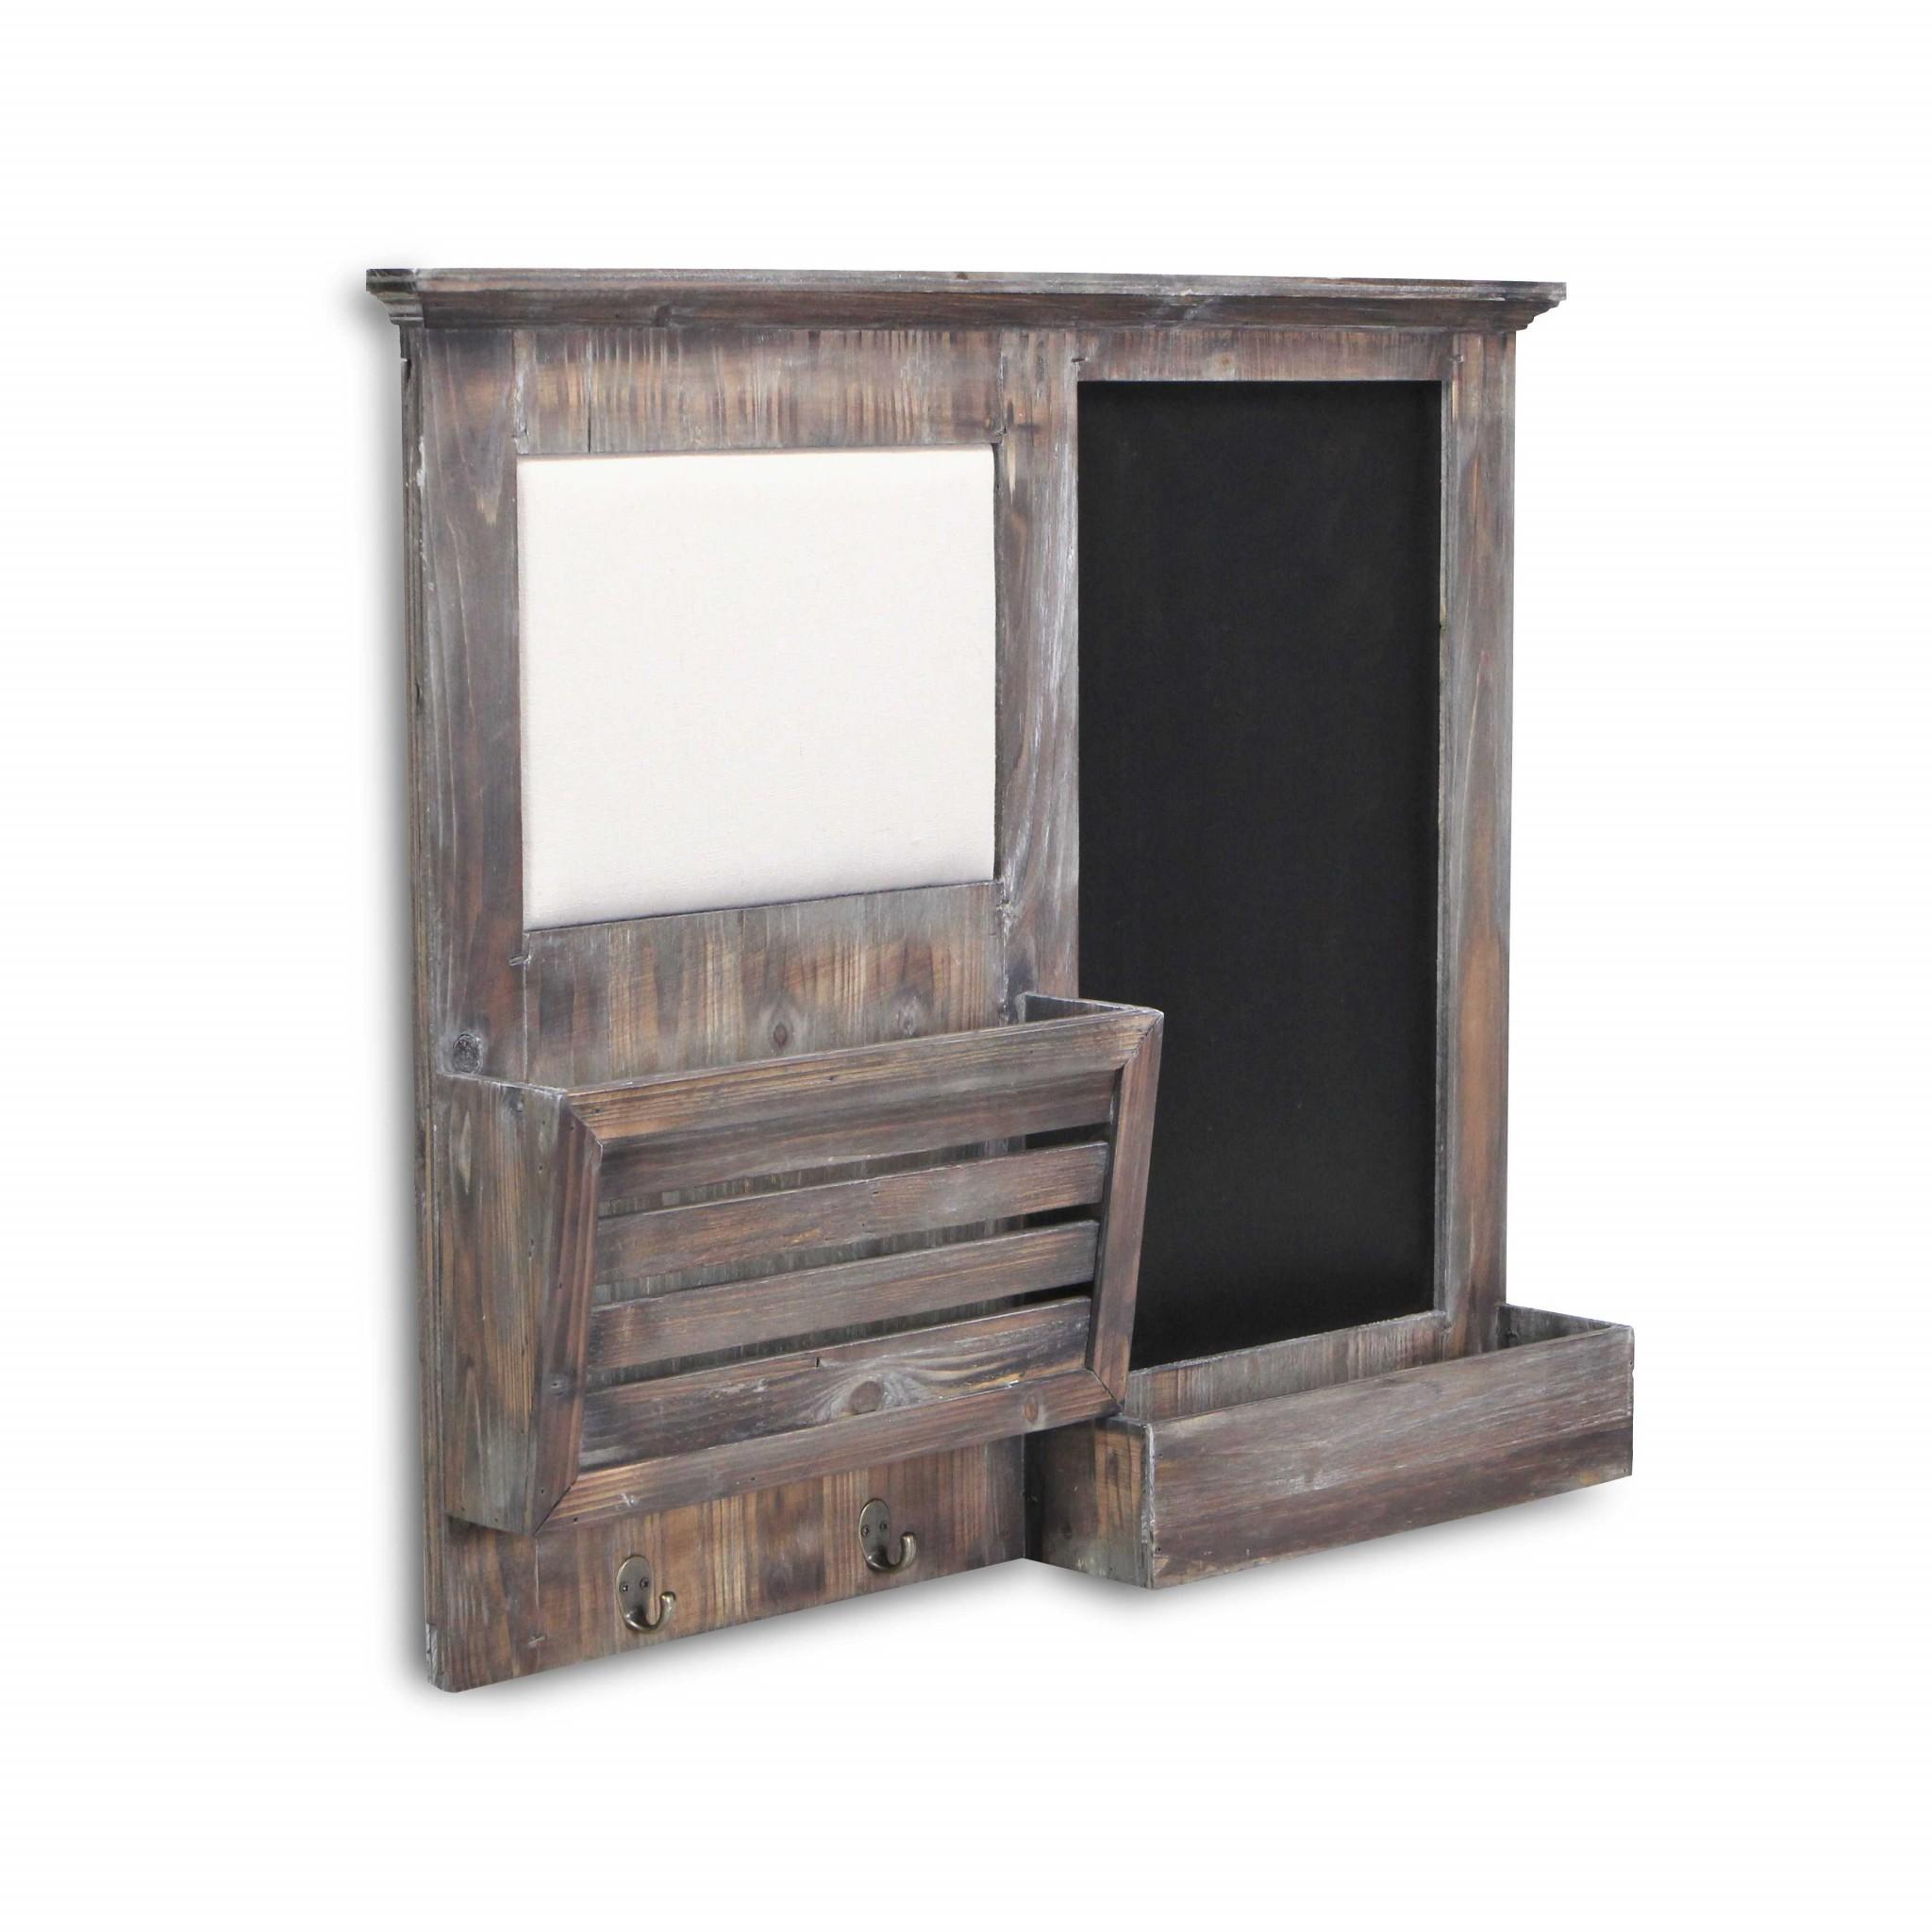 Gray Wooden Wall Chalkboard with Side Storage Basket